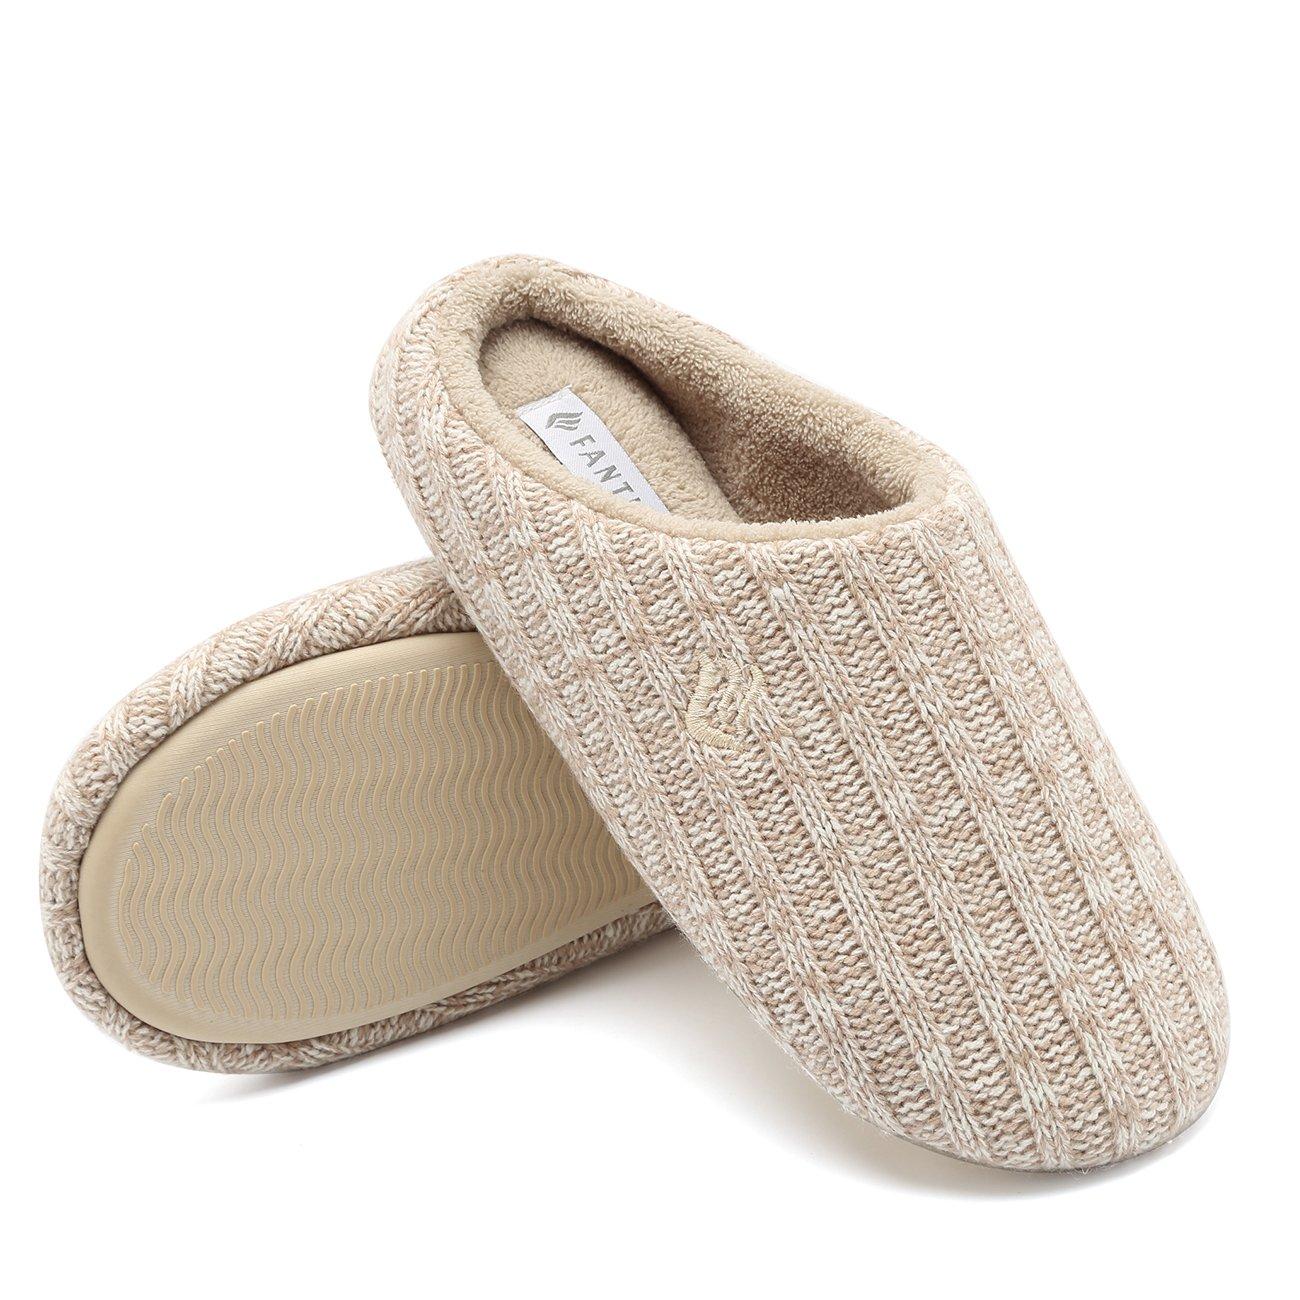 Fanture Women's House Slippers Indoor Memory Foam Cashmere Cotton Knitted Autumn Winter Anti-slip-U4MTW005-Khaki-42-43